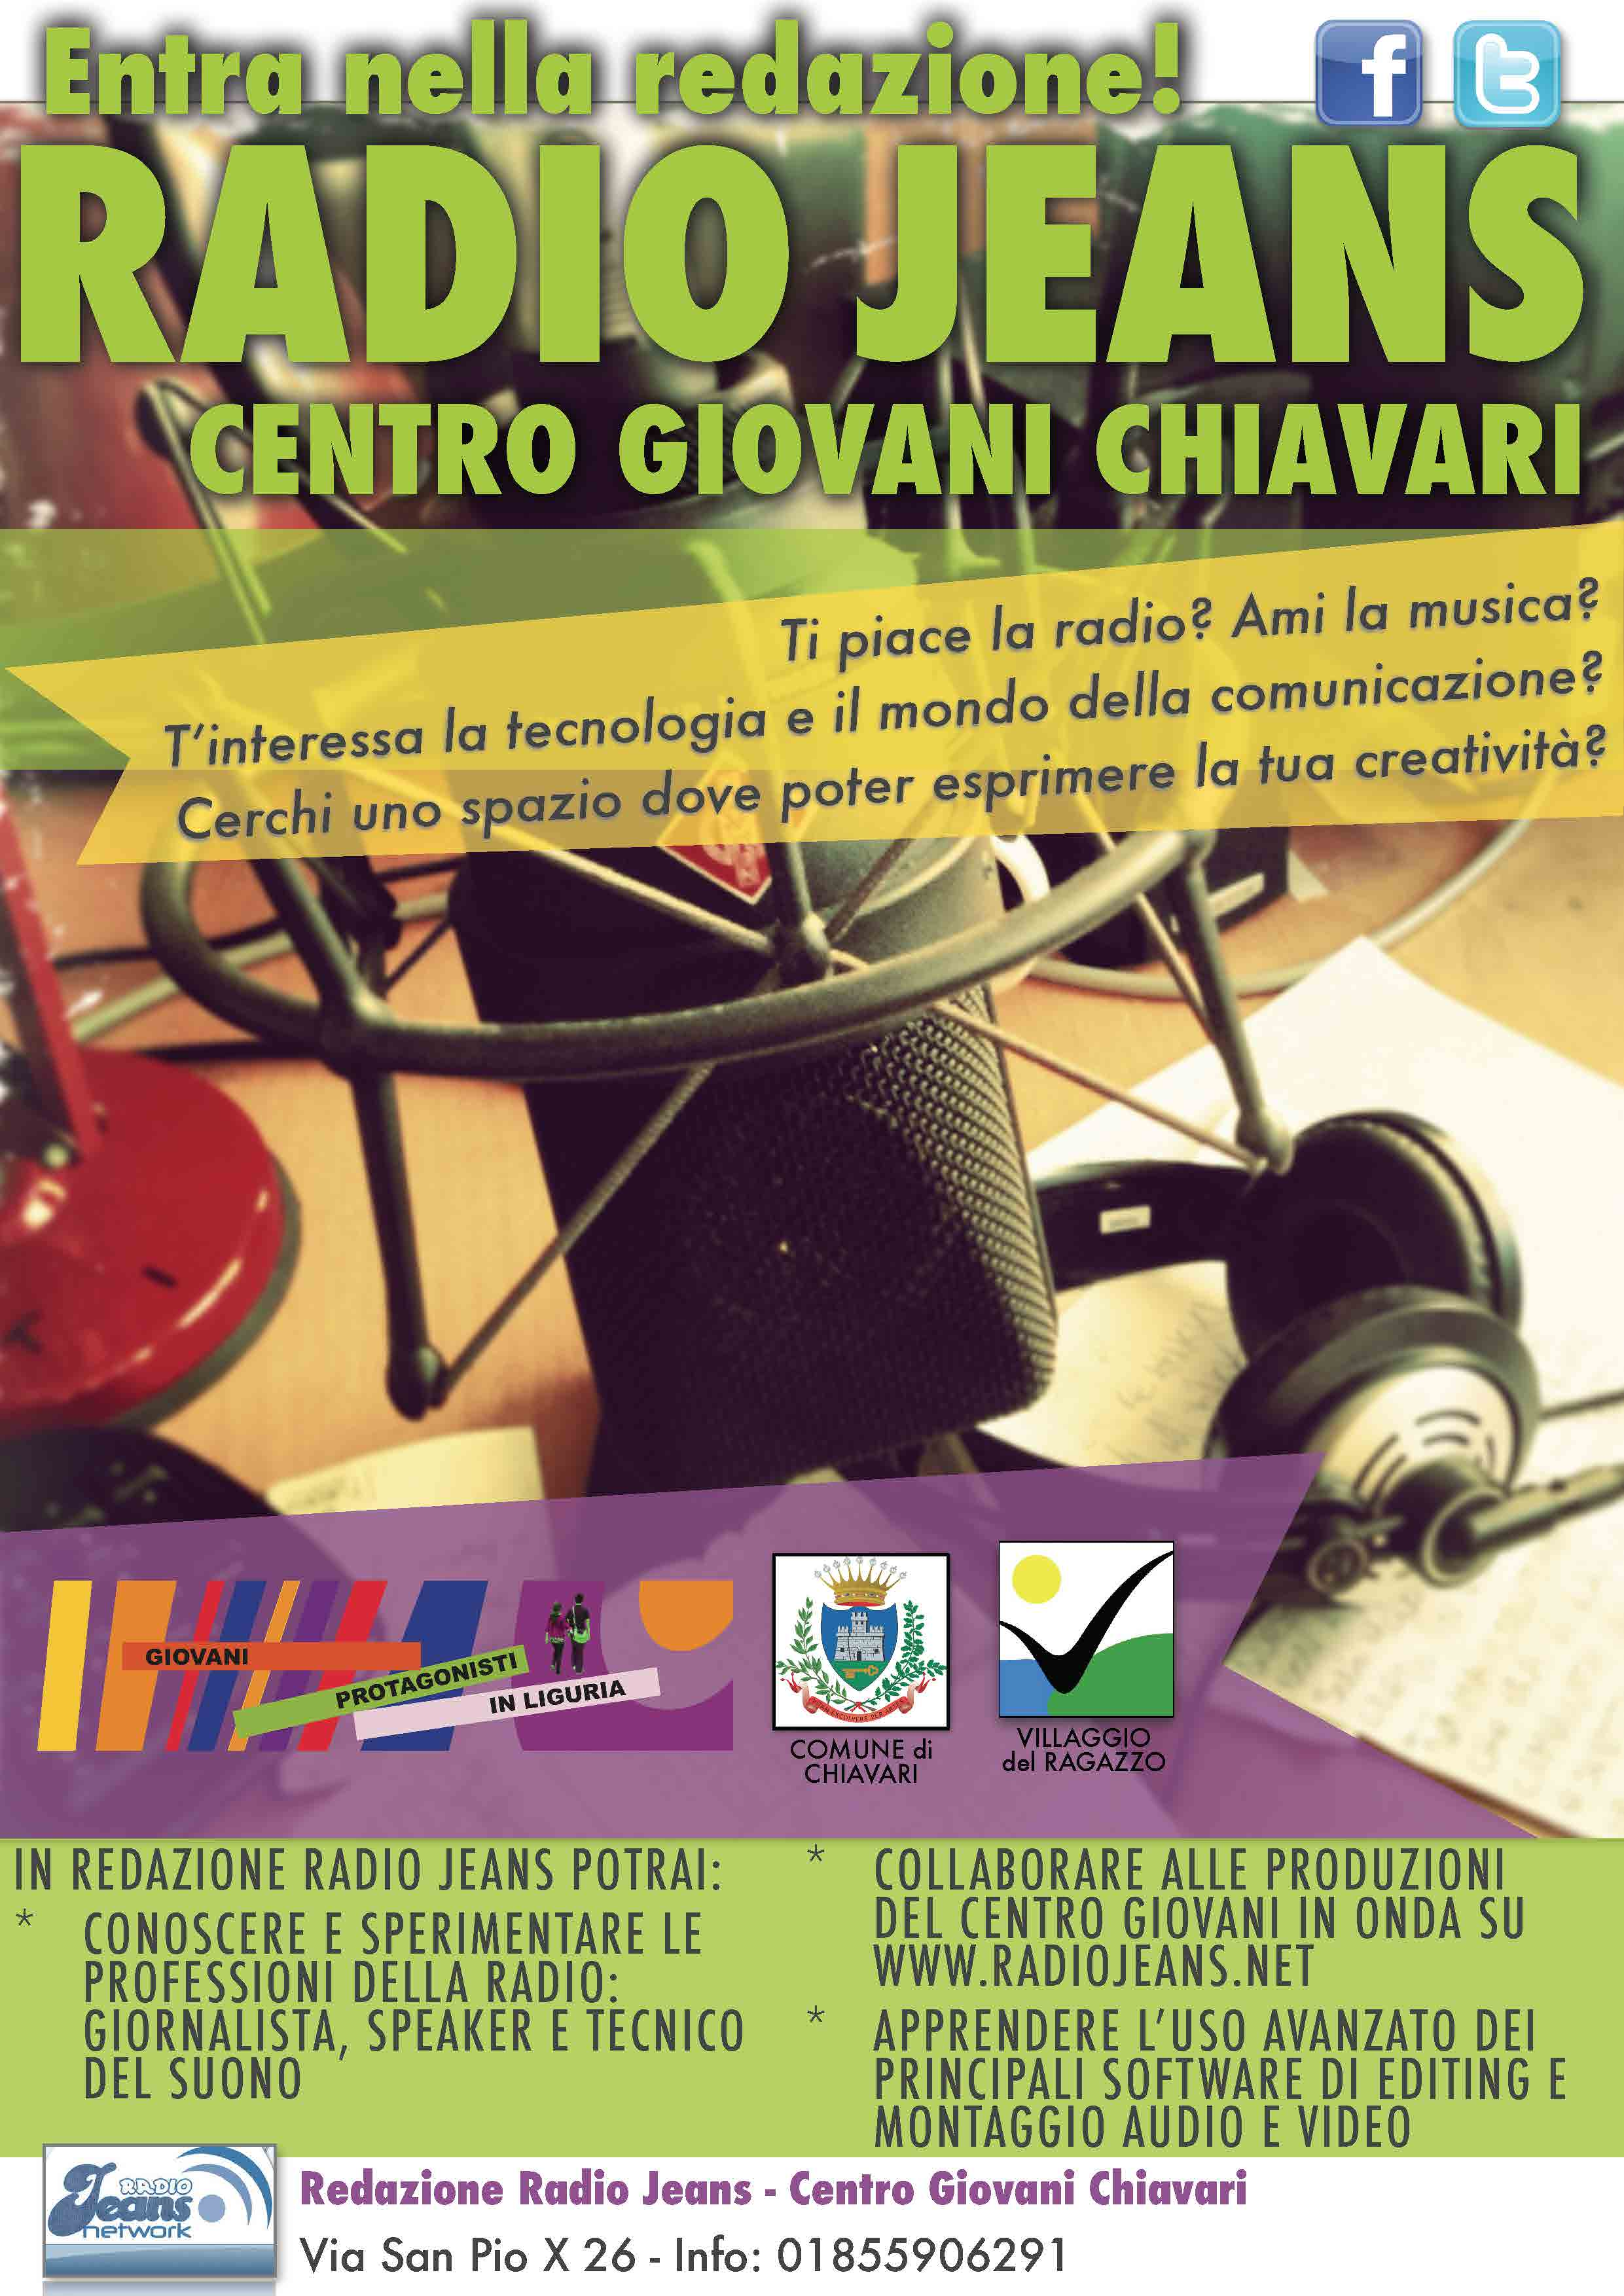 Radio Jeans - Centro Giovani Chiavari - Locandina Promo